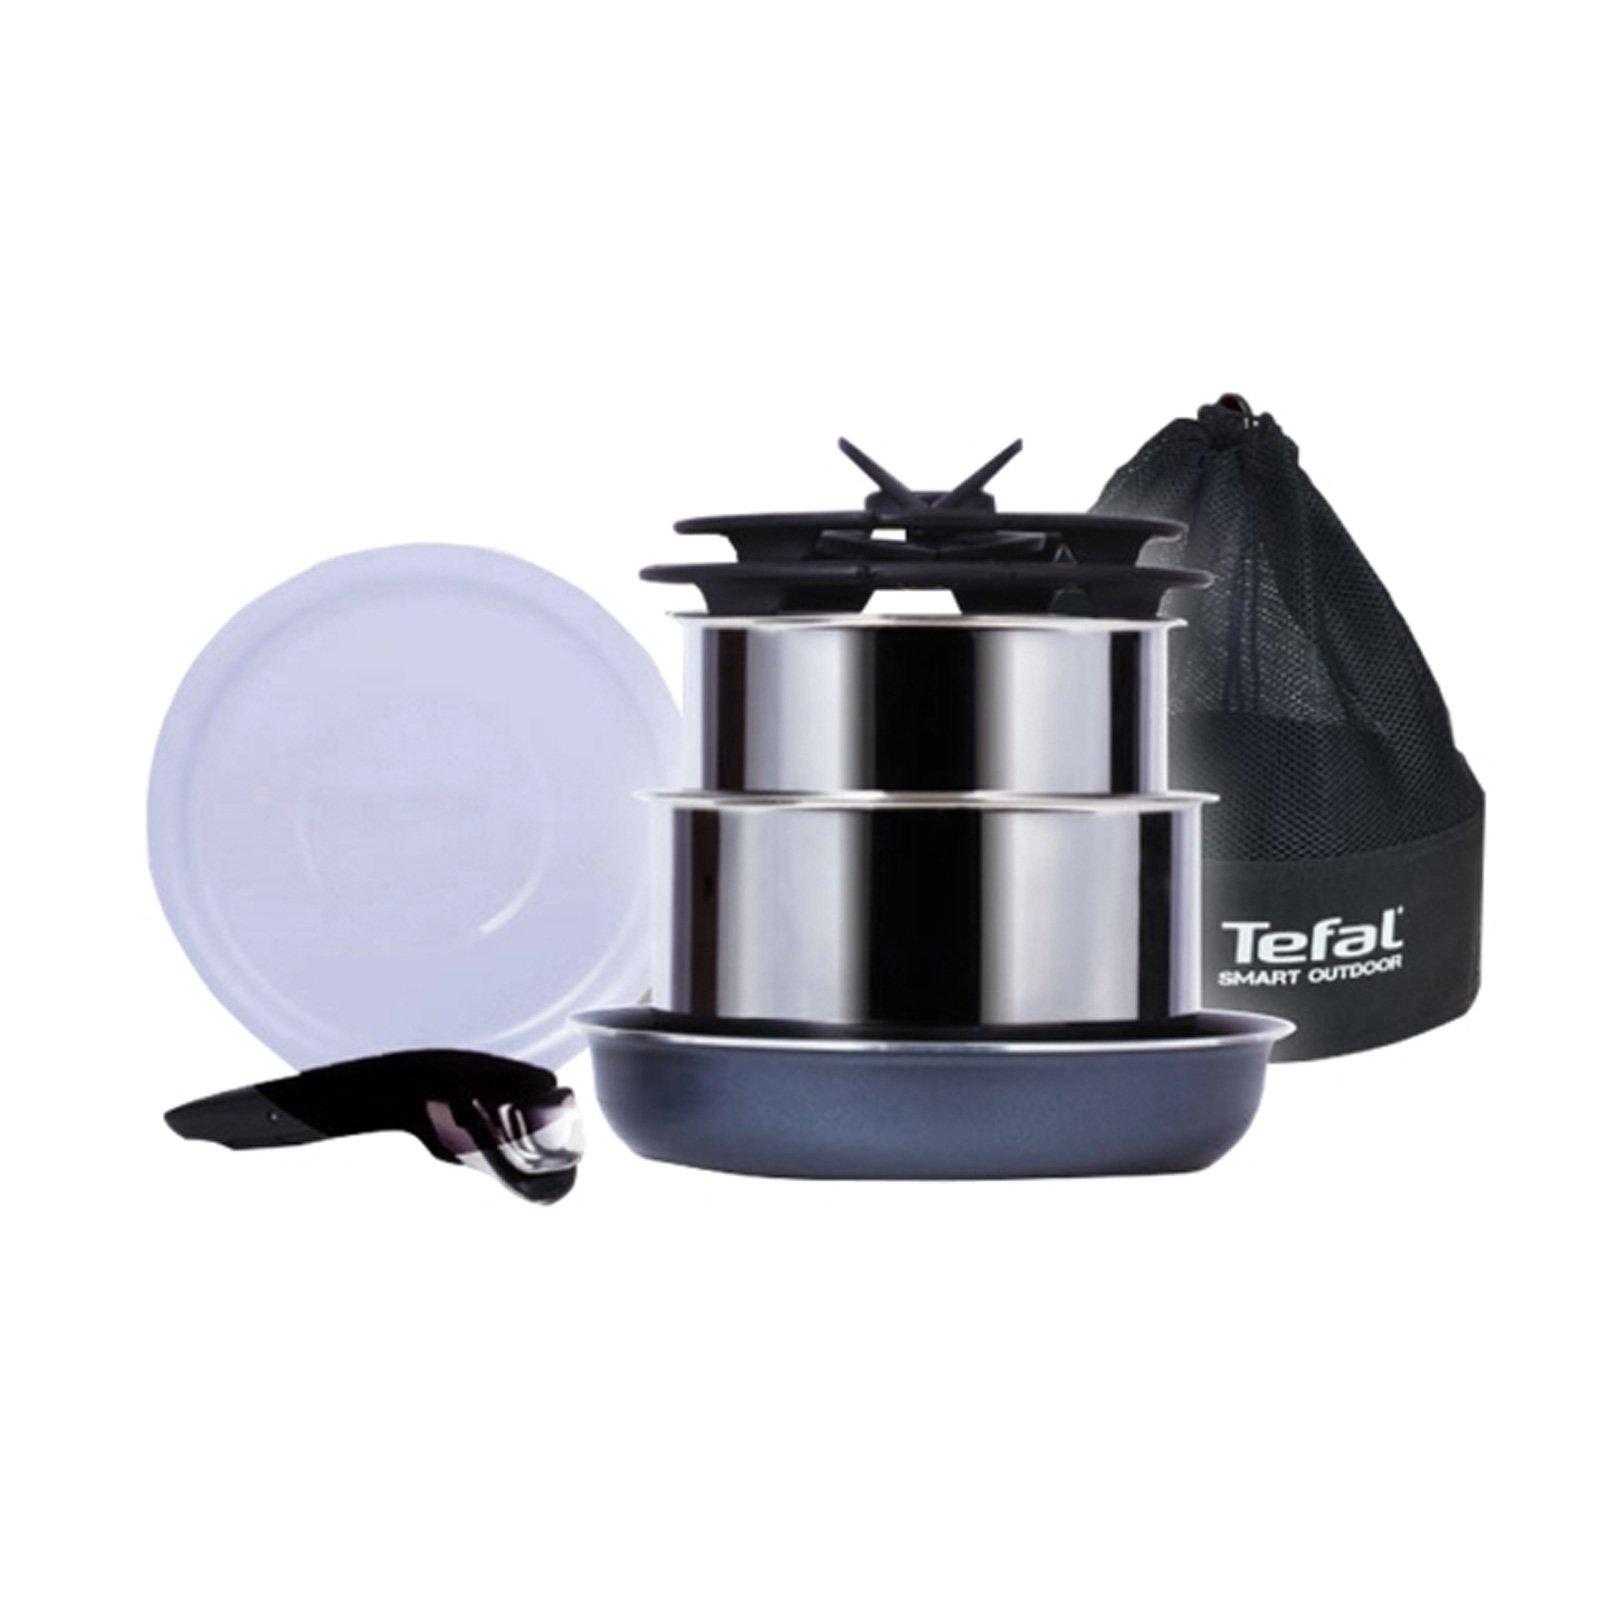 Tefal Smart Outdoor Magic Hands Camping 7P Set Stainless Pot Fry Pan Glass Lids